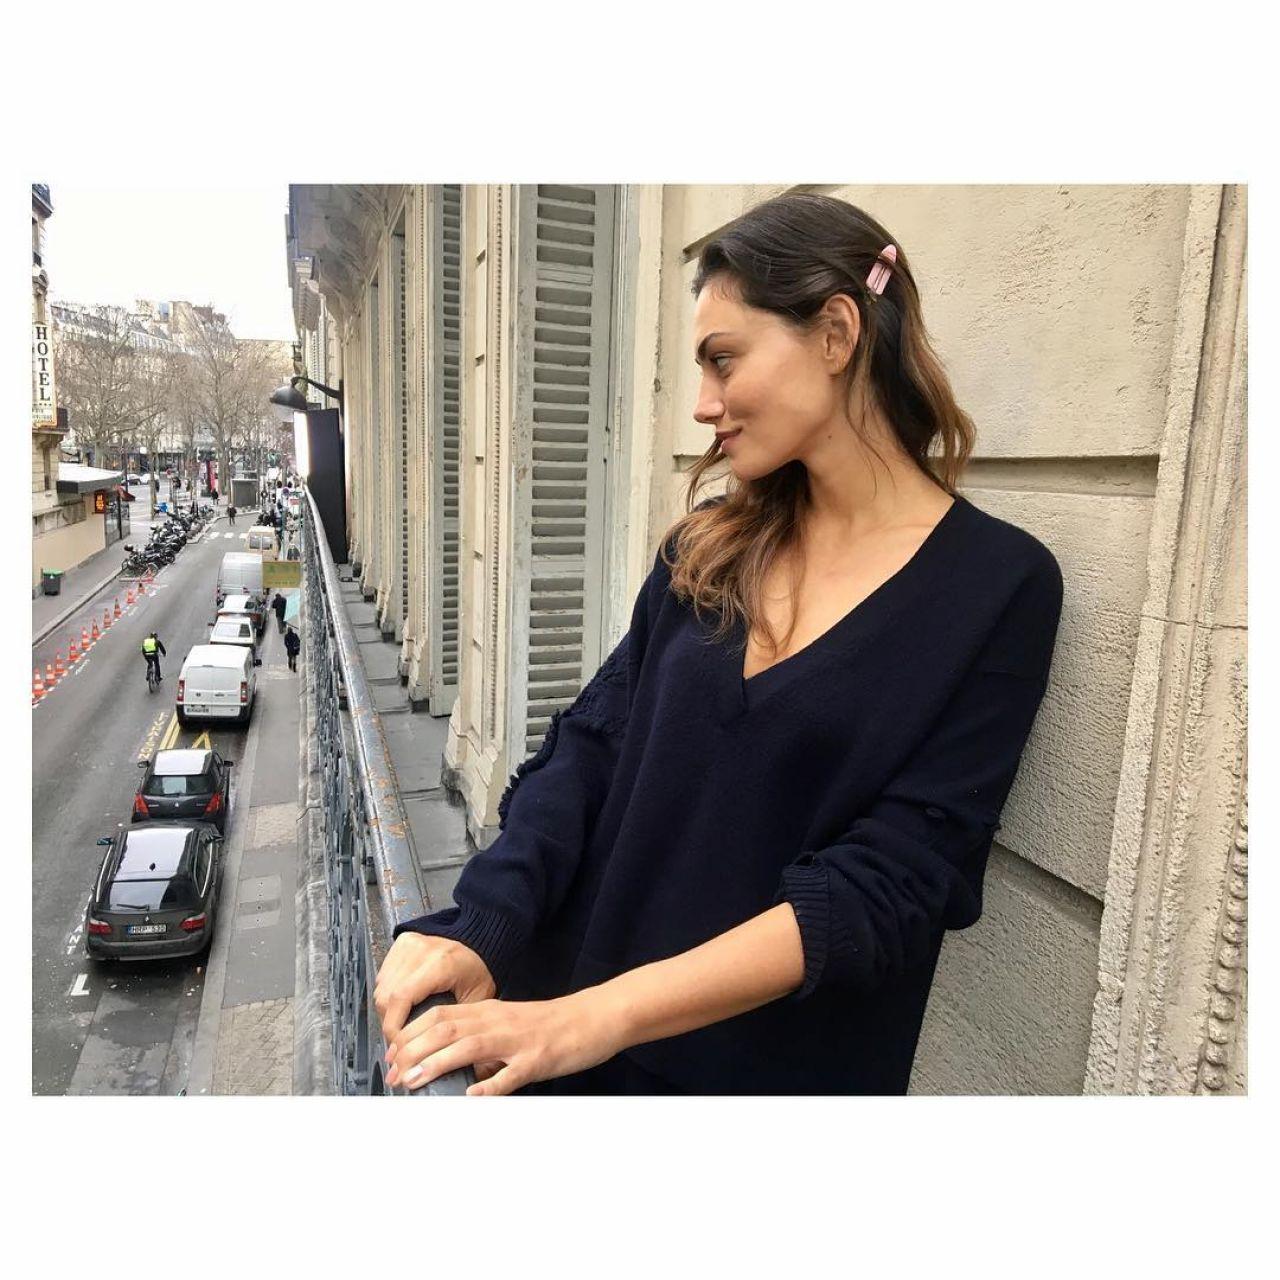 Phoebe Tonkin Social Media Photos 3/25/ 2017